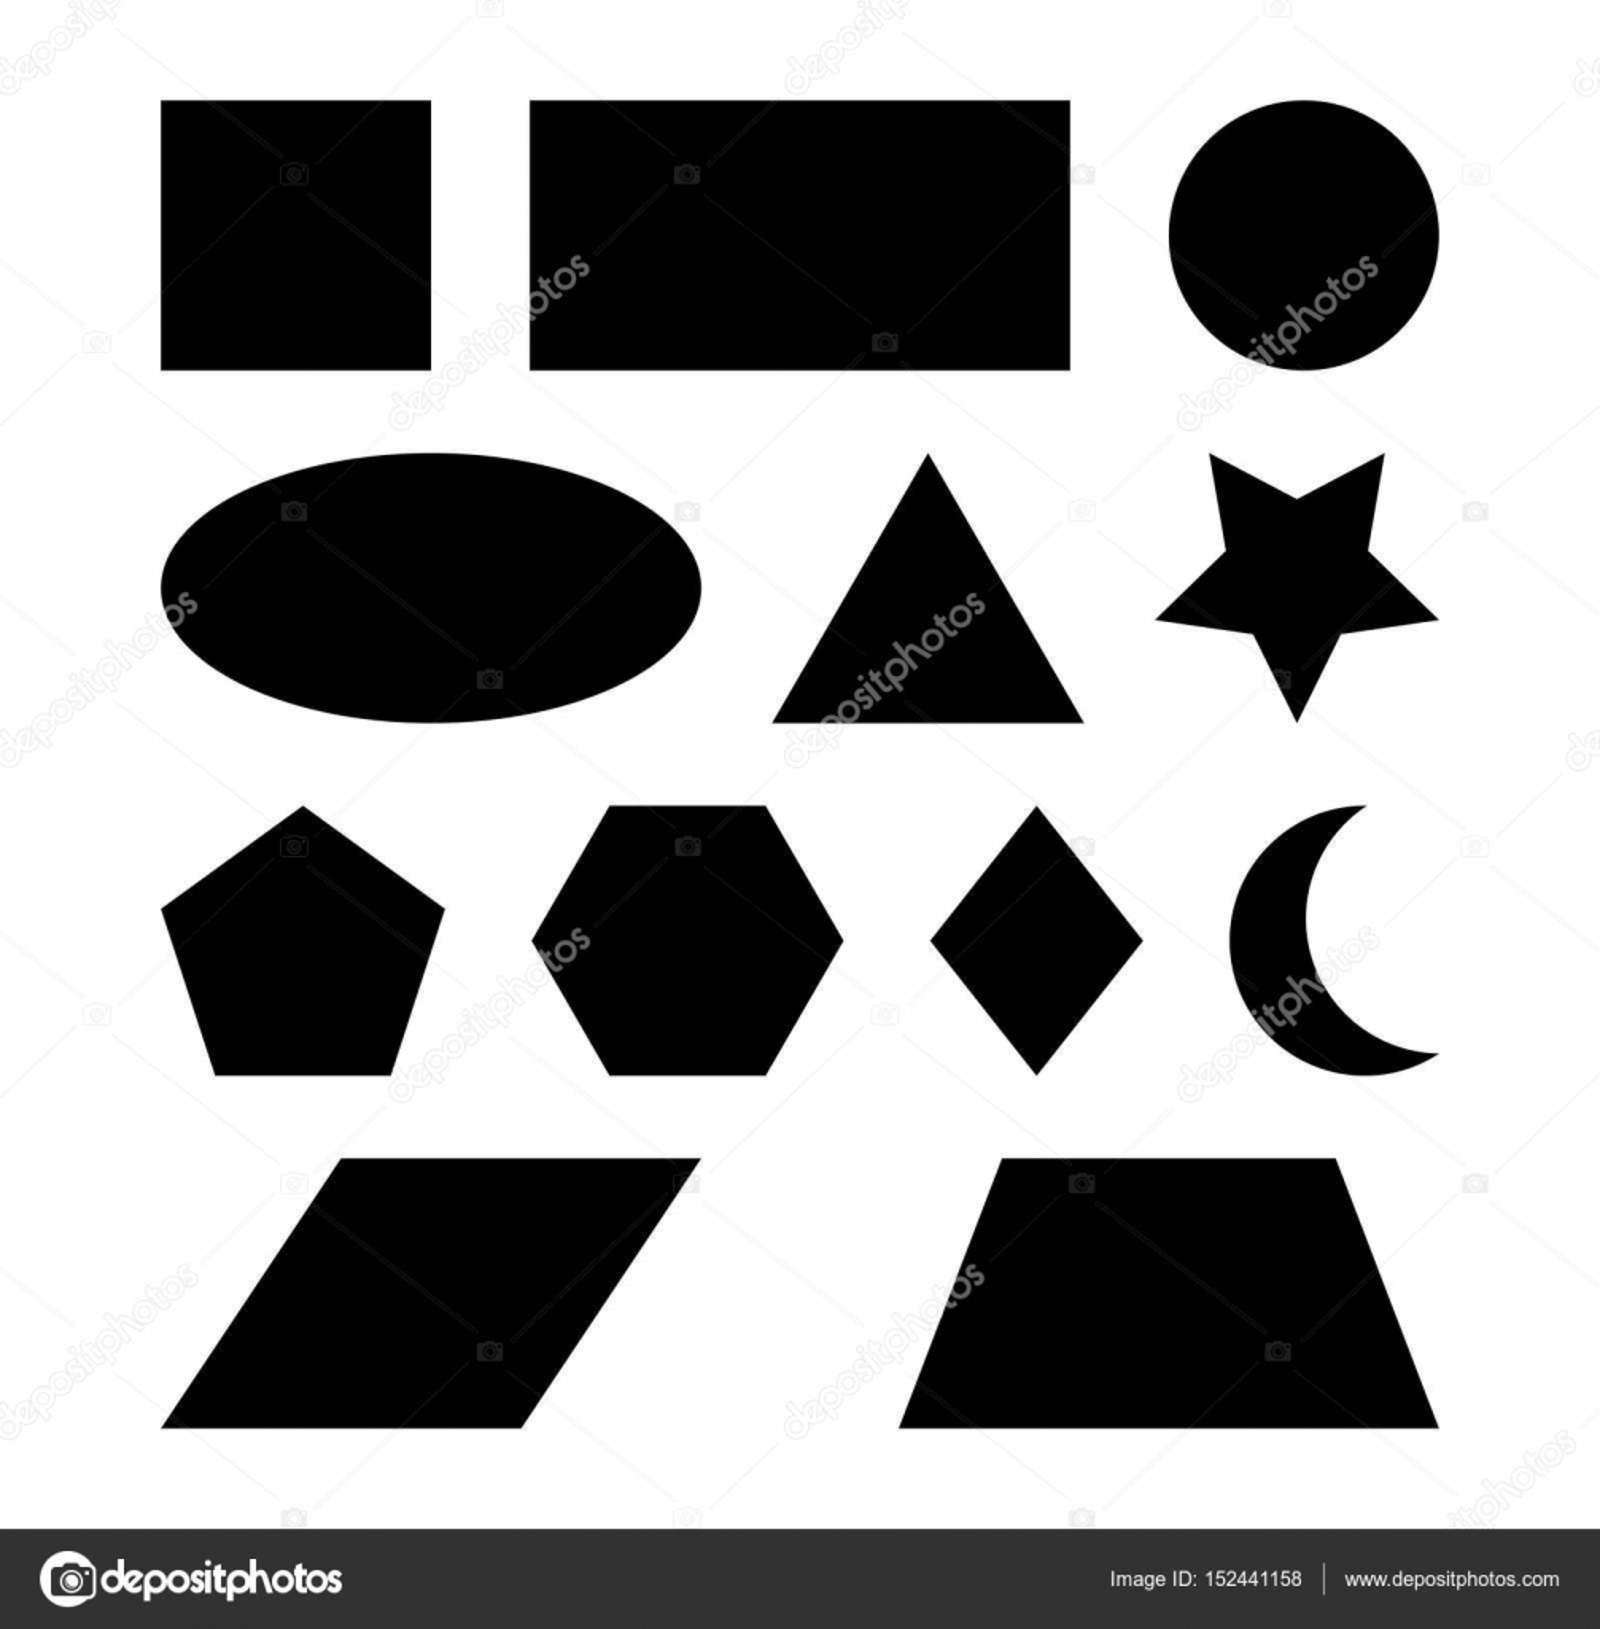 Geometric shapes vector symbol icon design stock vector geometric shapes vector symbol icon design stock vector buycottarizona